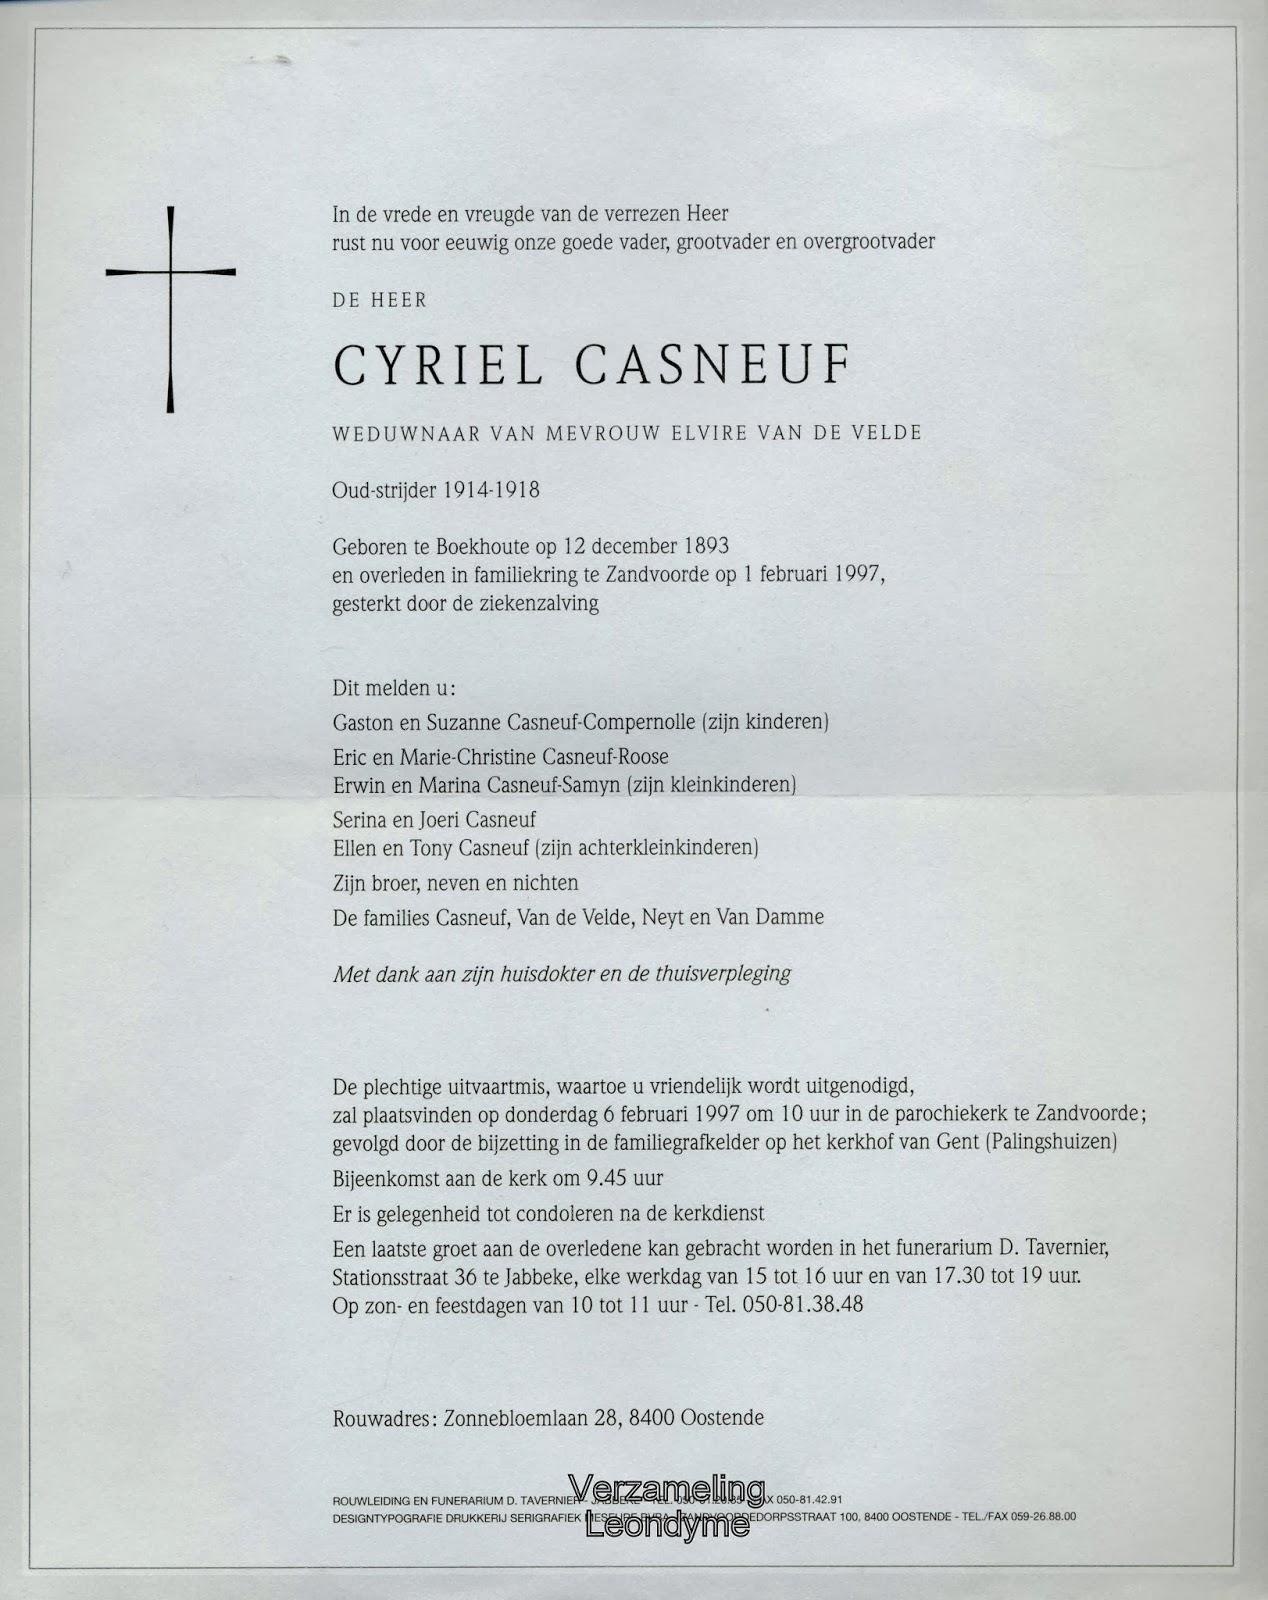 Rouwbrief Cyriel Casneuf 1893-1997. Verzameling Leondyme